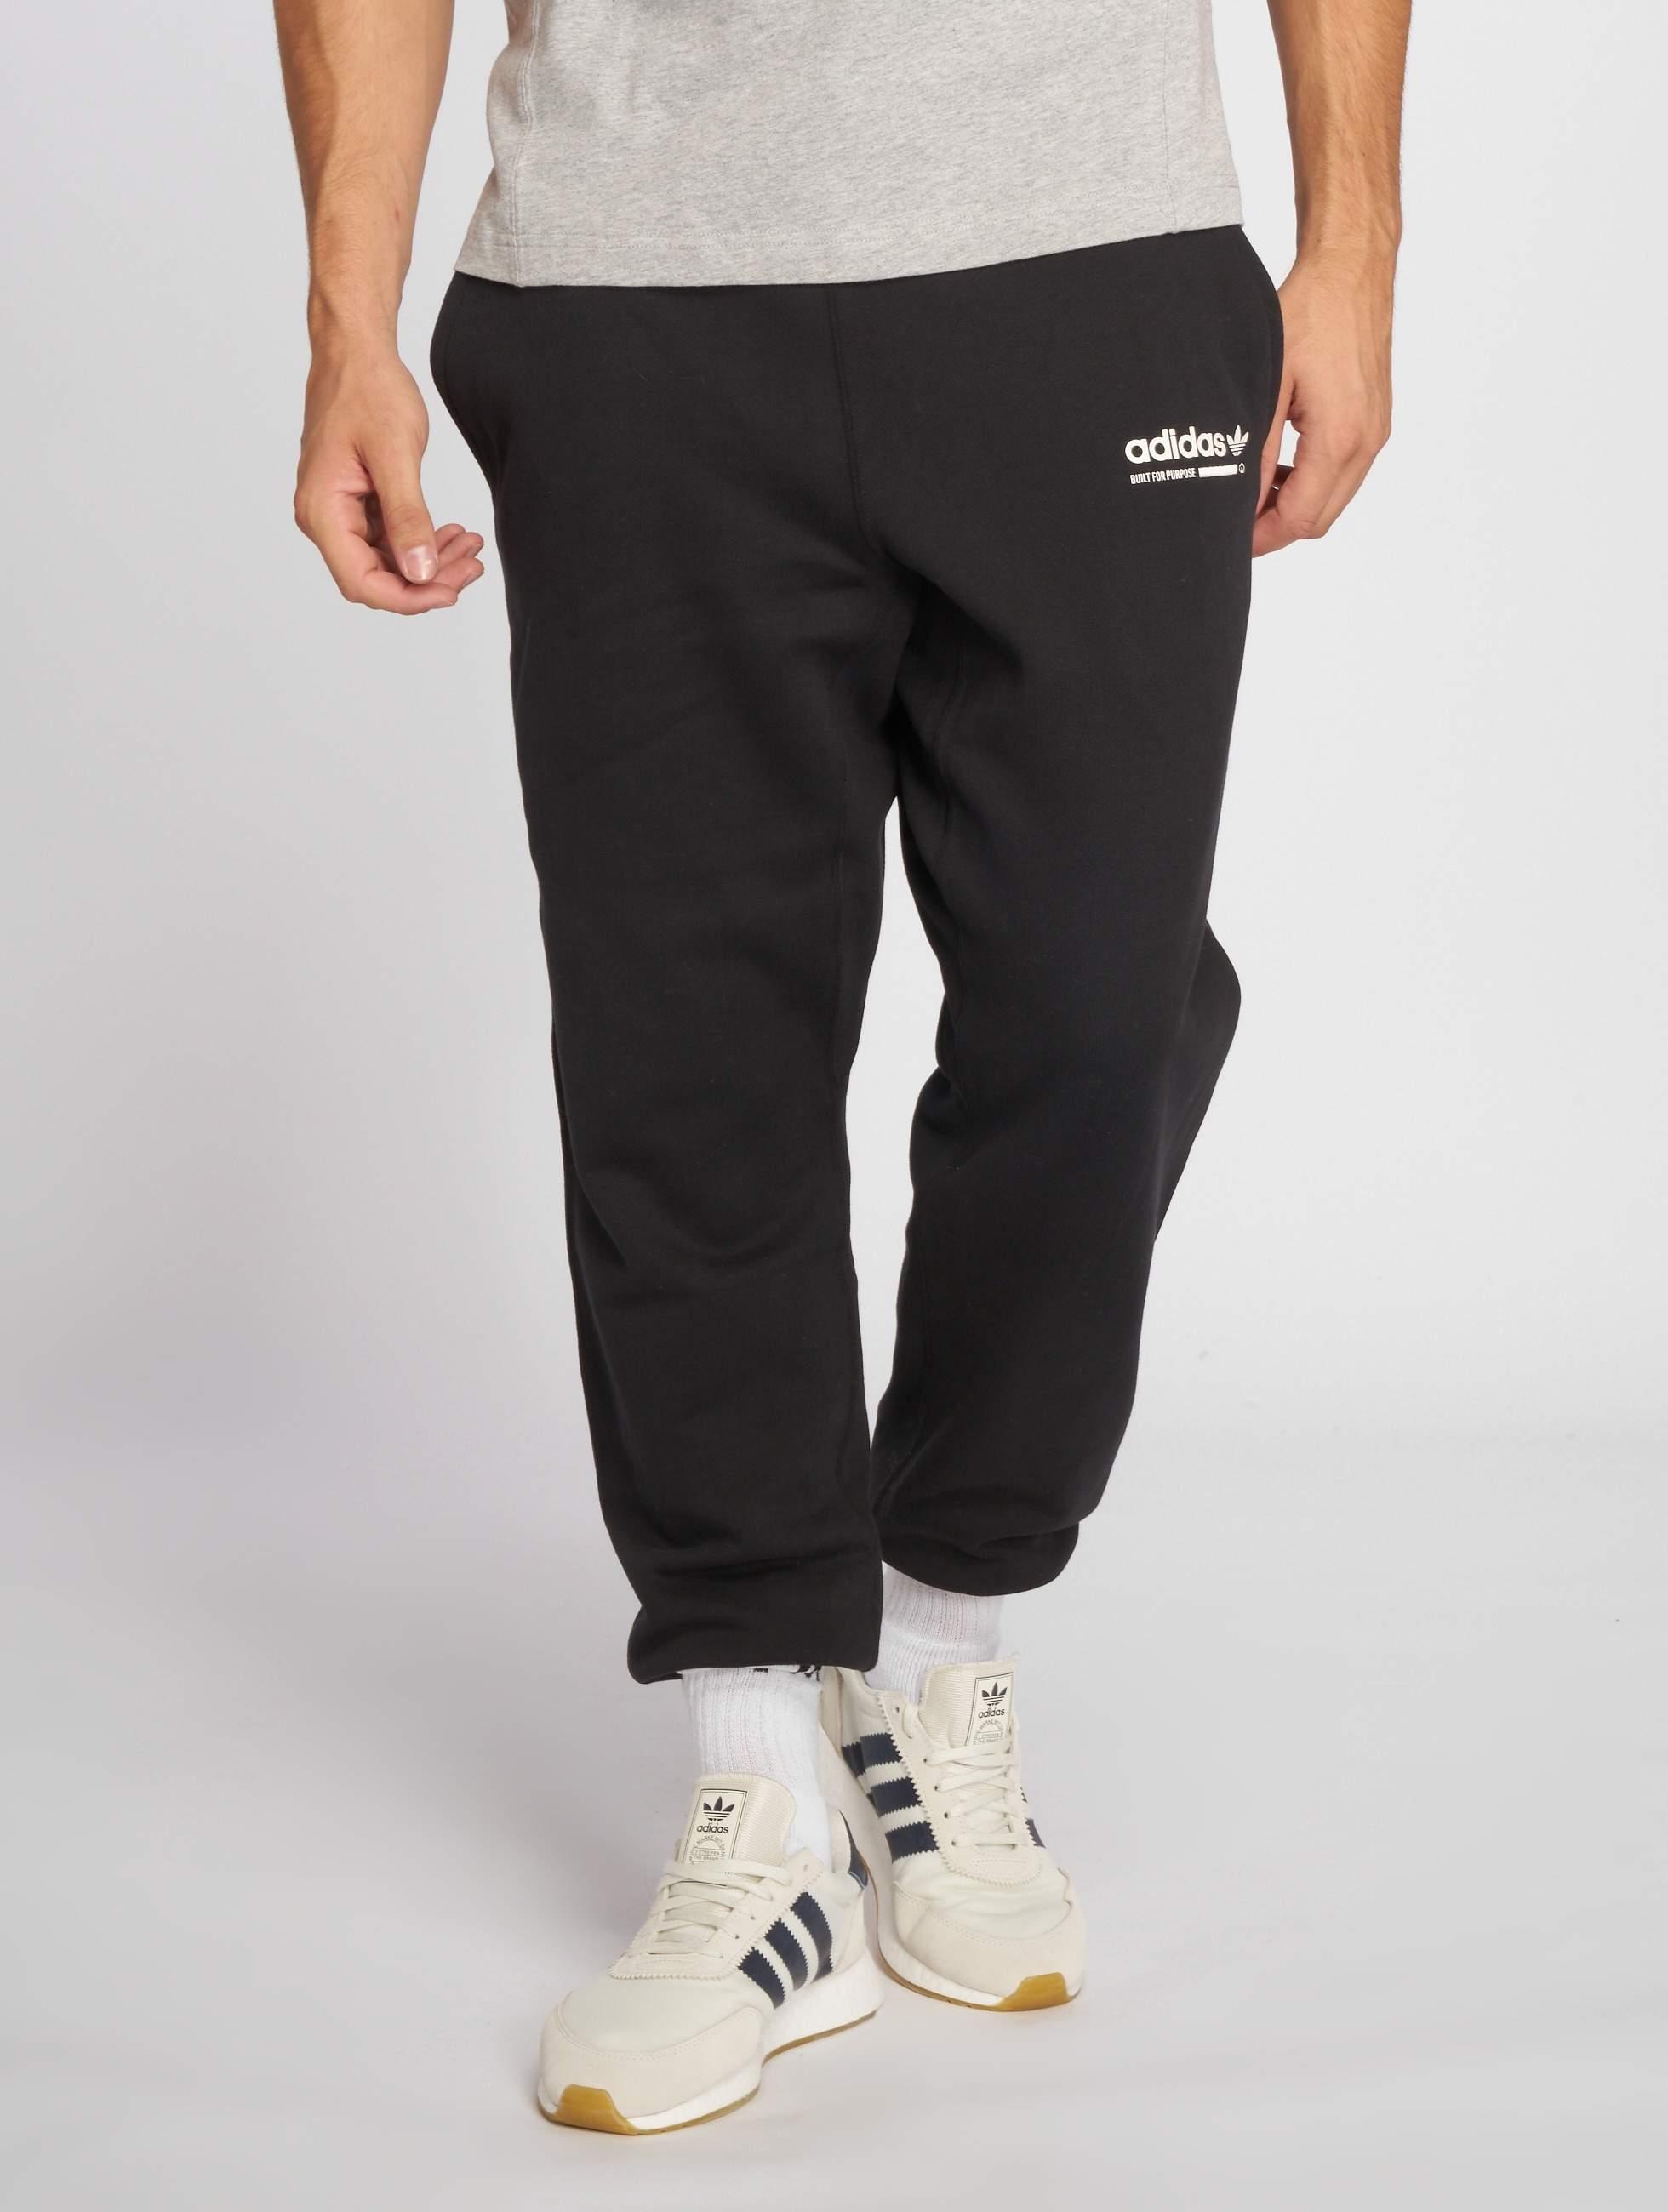 bd8eddab87f adidas originals broek / joggingbroek Kaval in zwart 499833